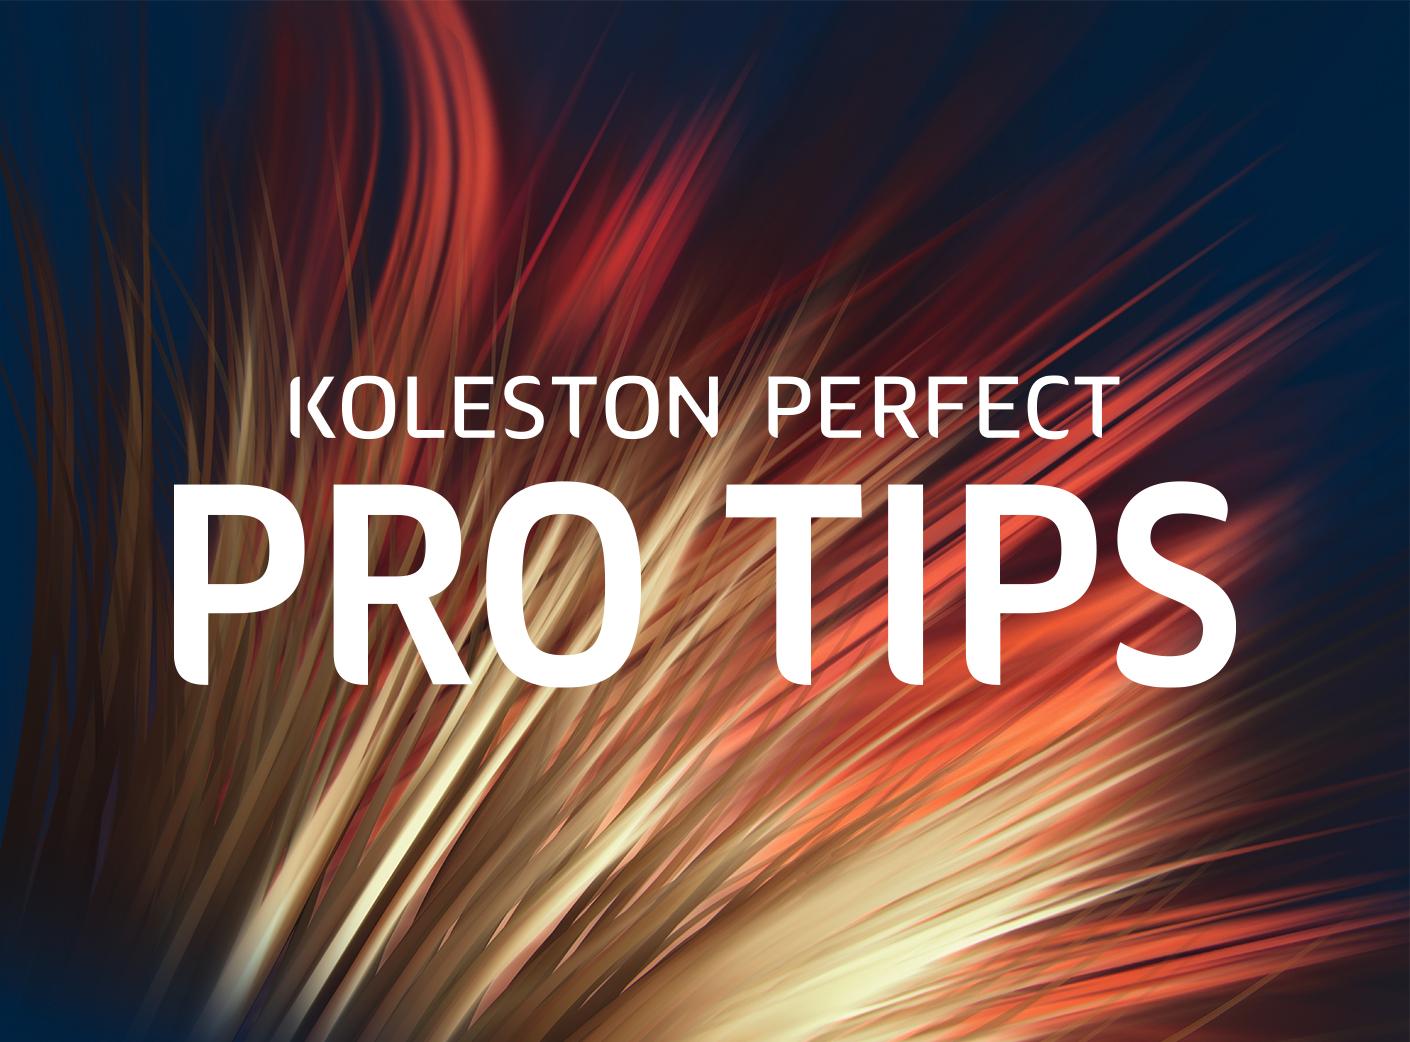 Koleston Perfect Pro Tips